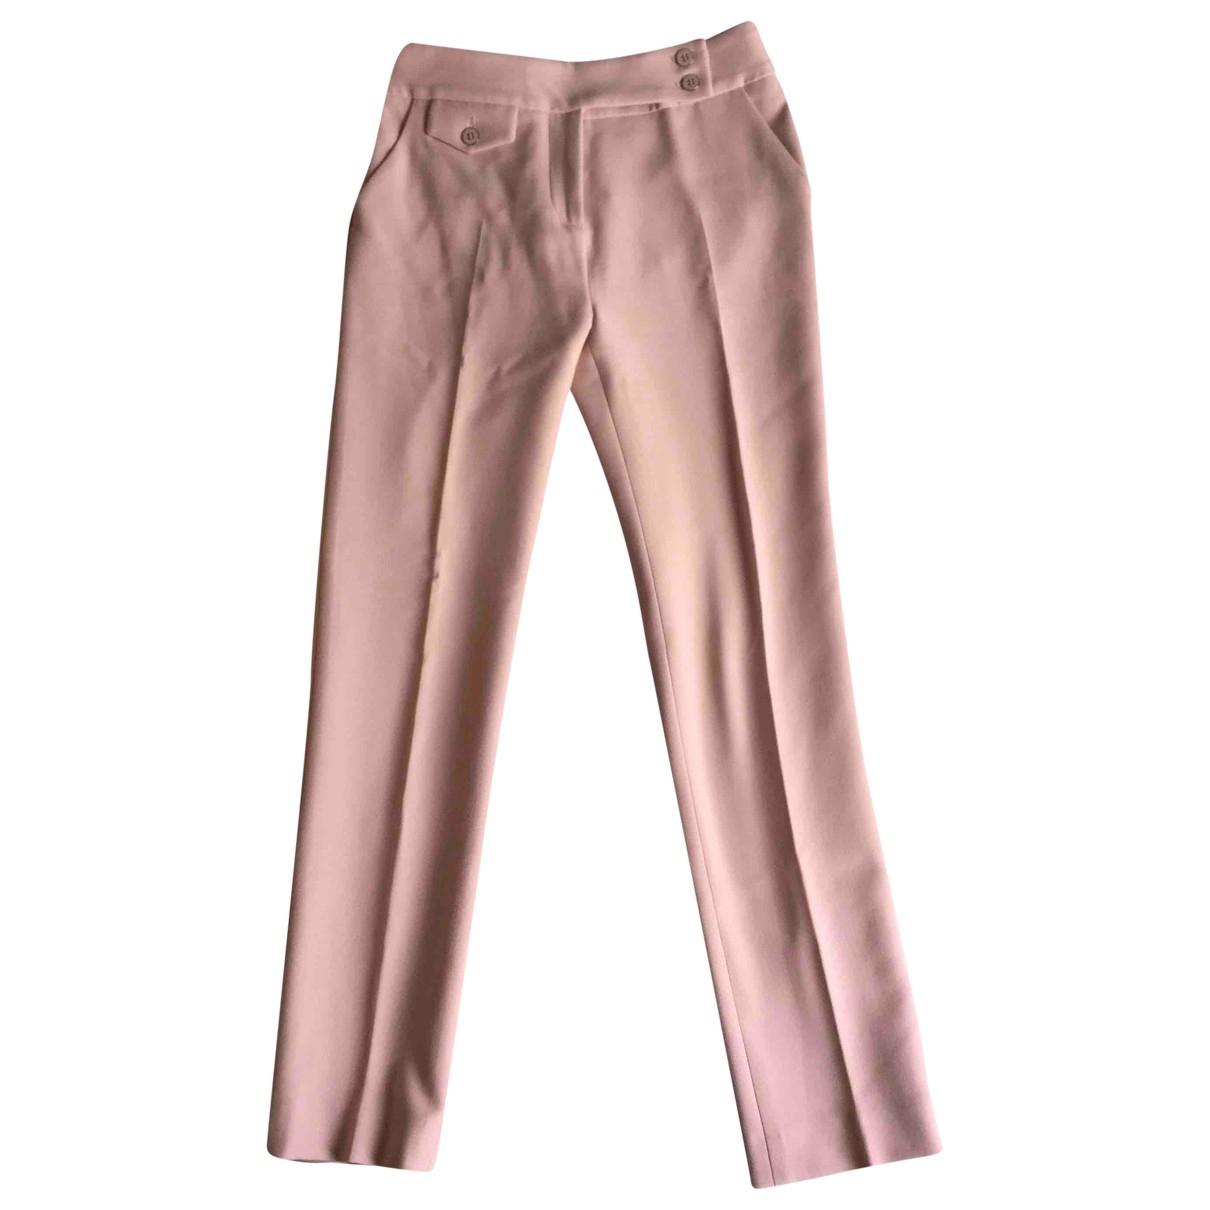 Veronica Beard \N Pink Trousers for Women XS International